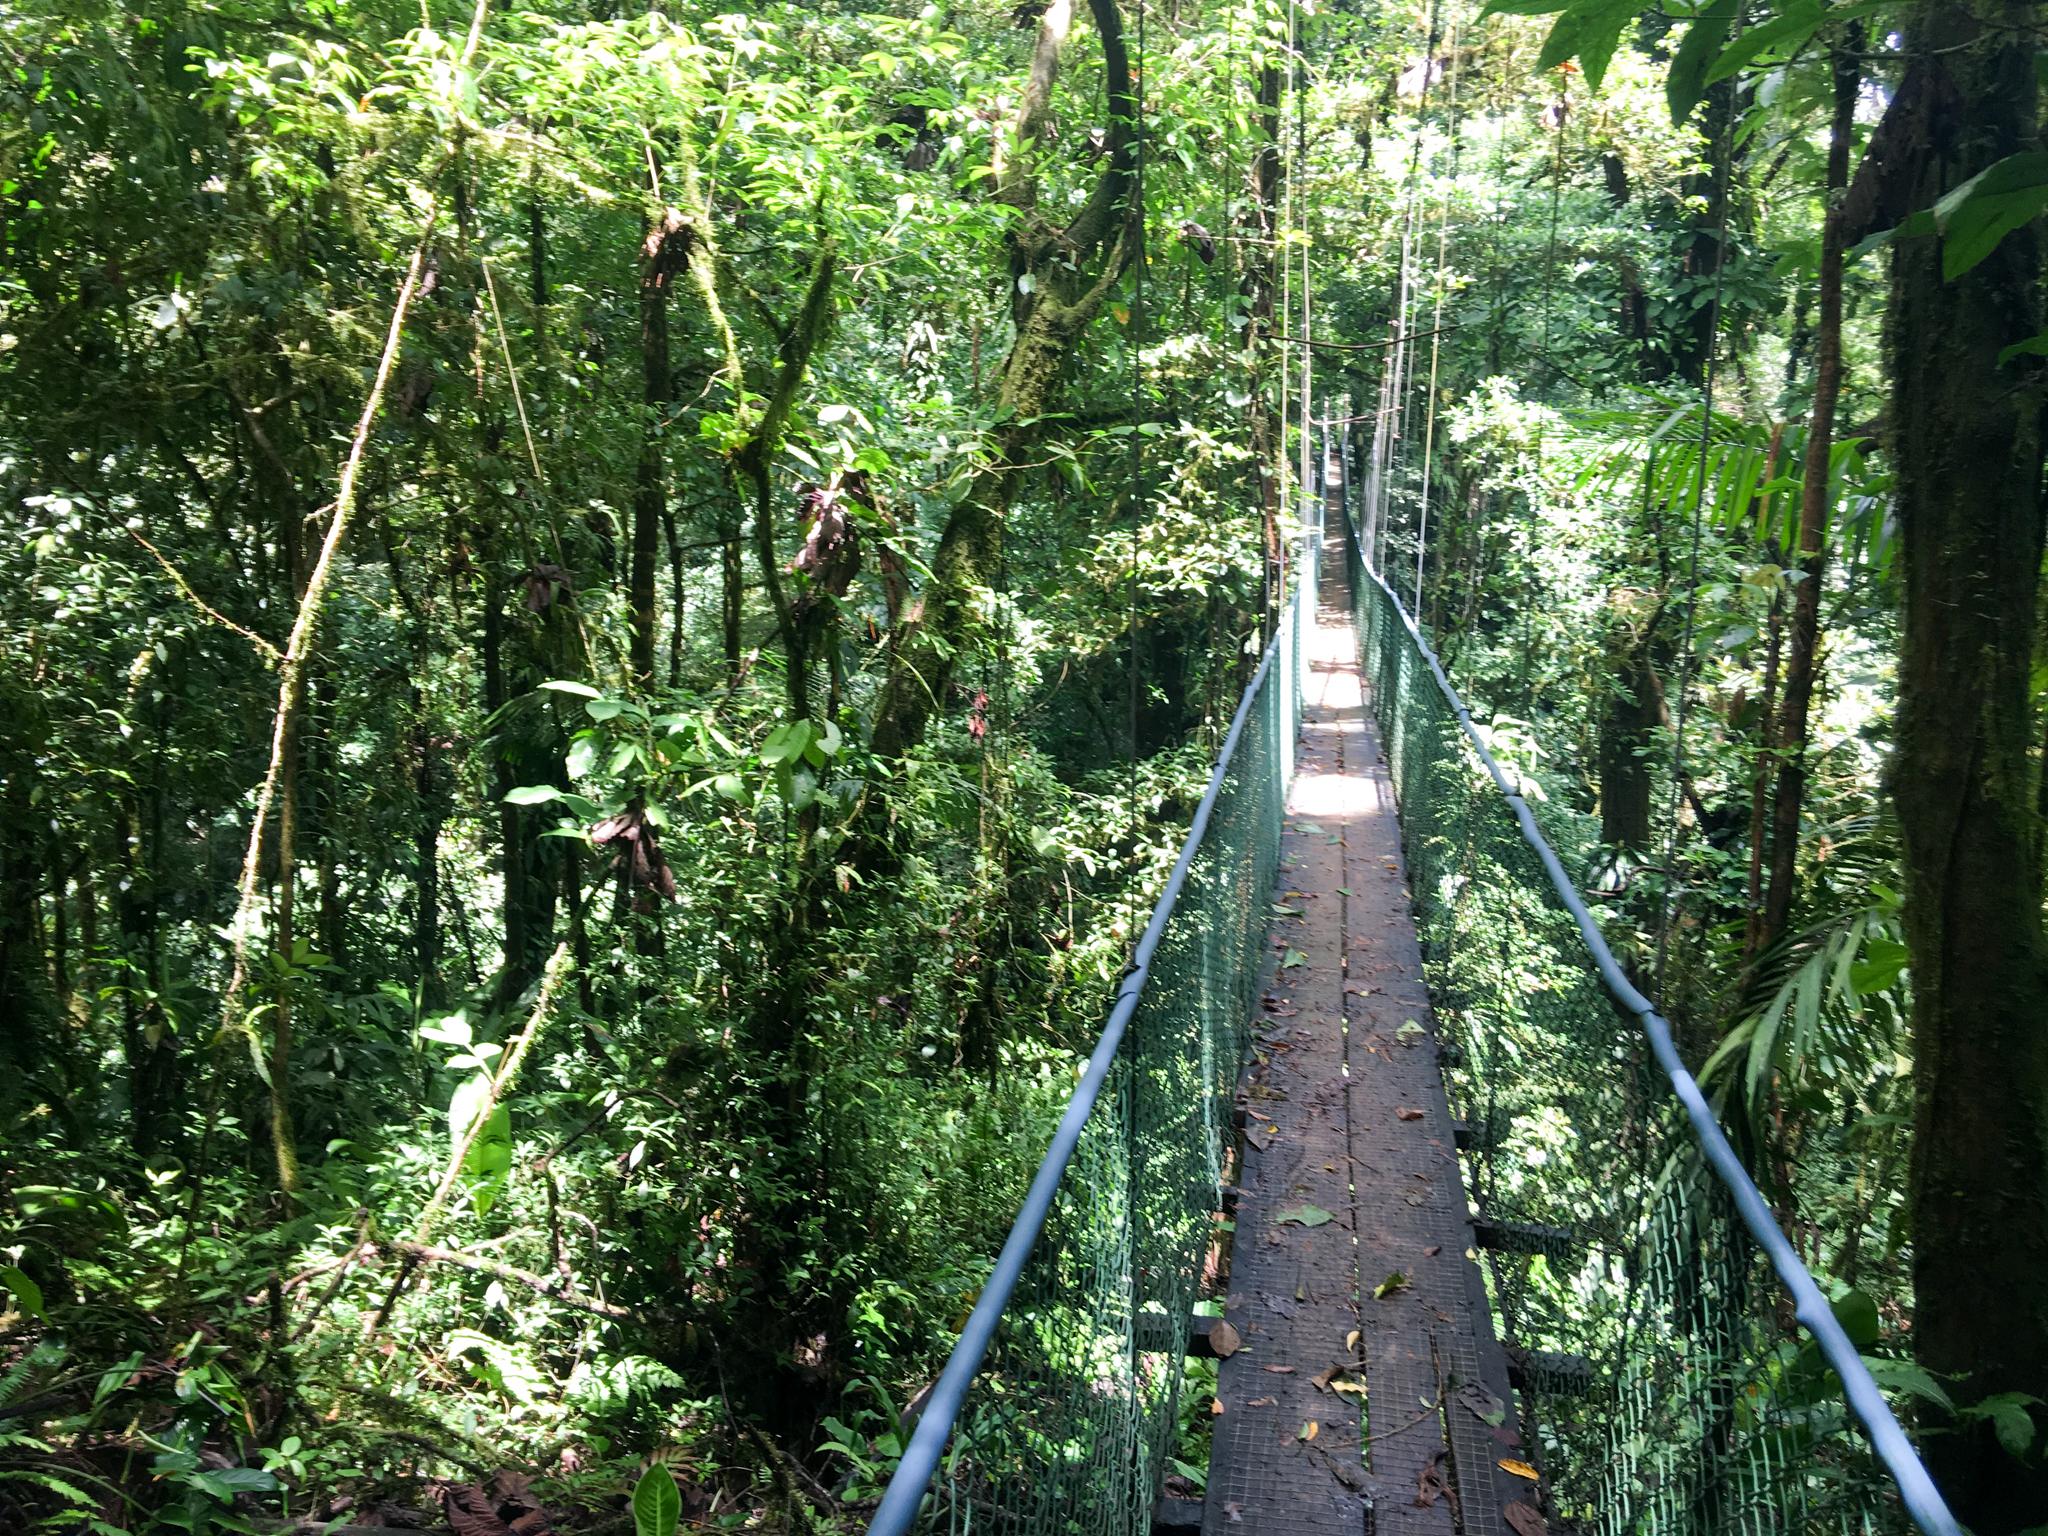 These bridges were much higher, much longer, and much sketchier.